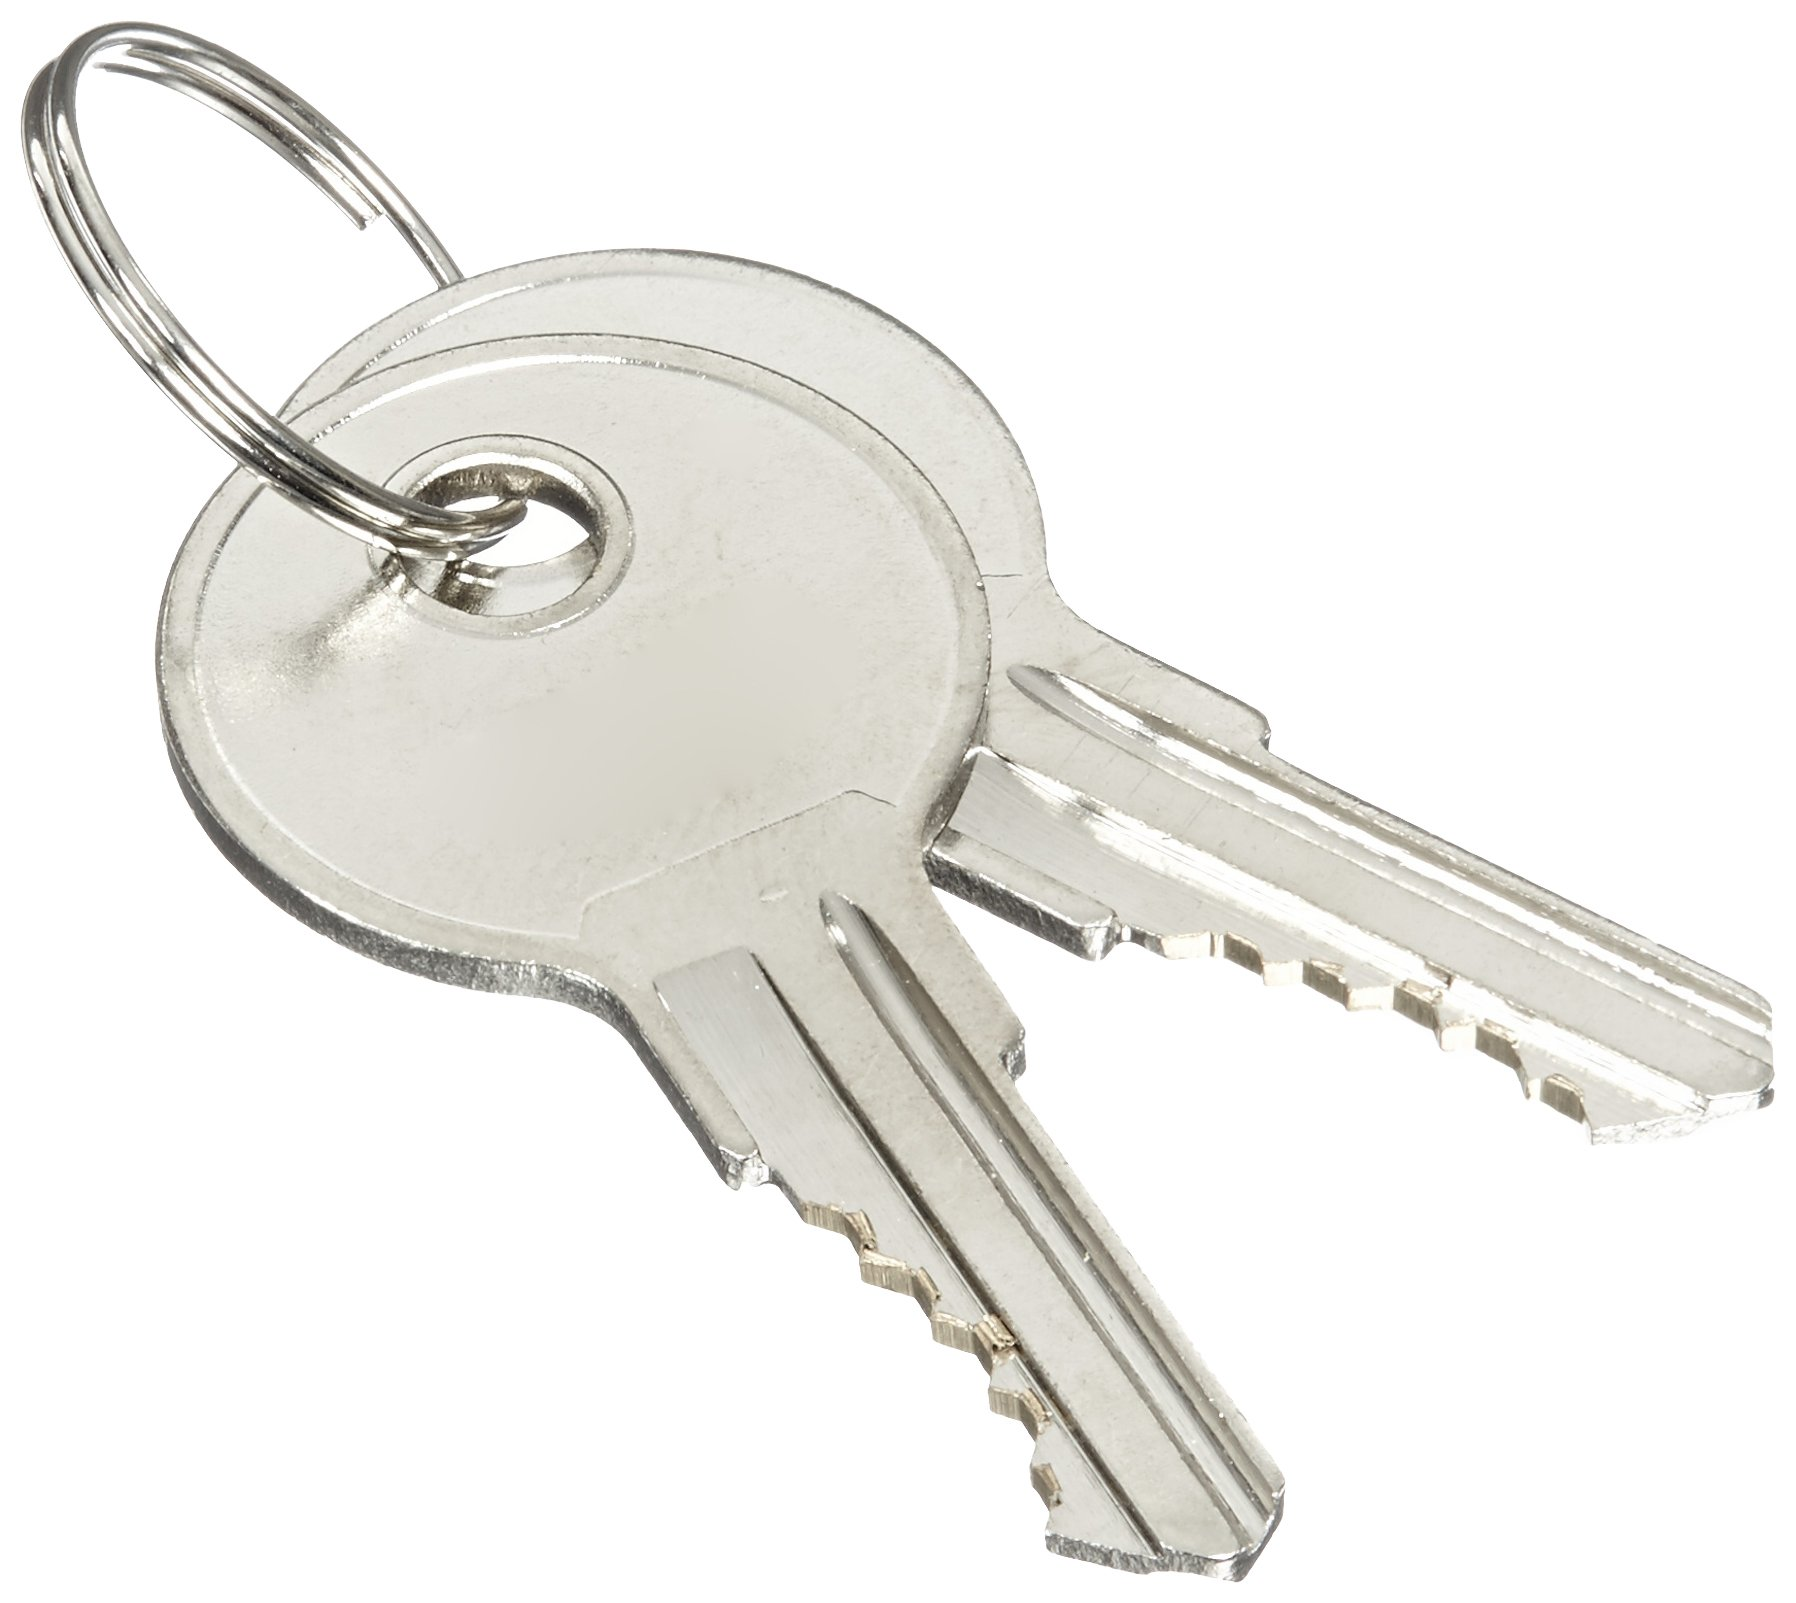 Justrite 25998 2 Piece Suregrip Safety Cabinet Handle Key Set by Justrite